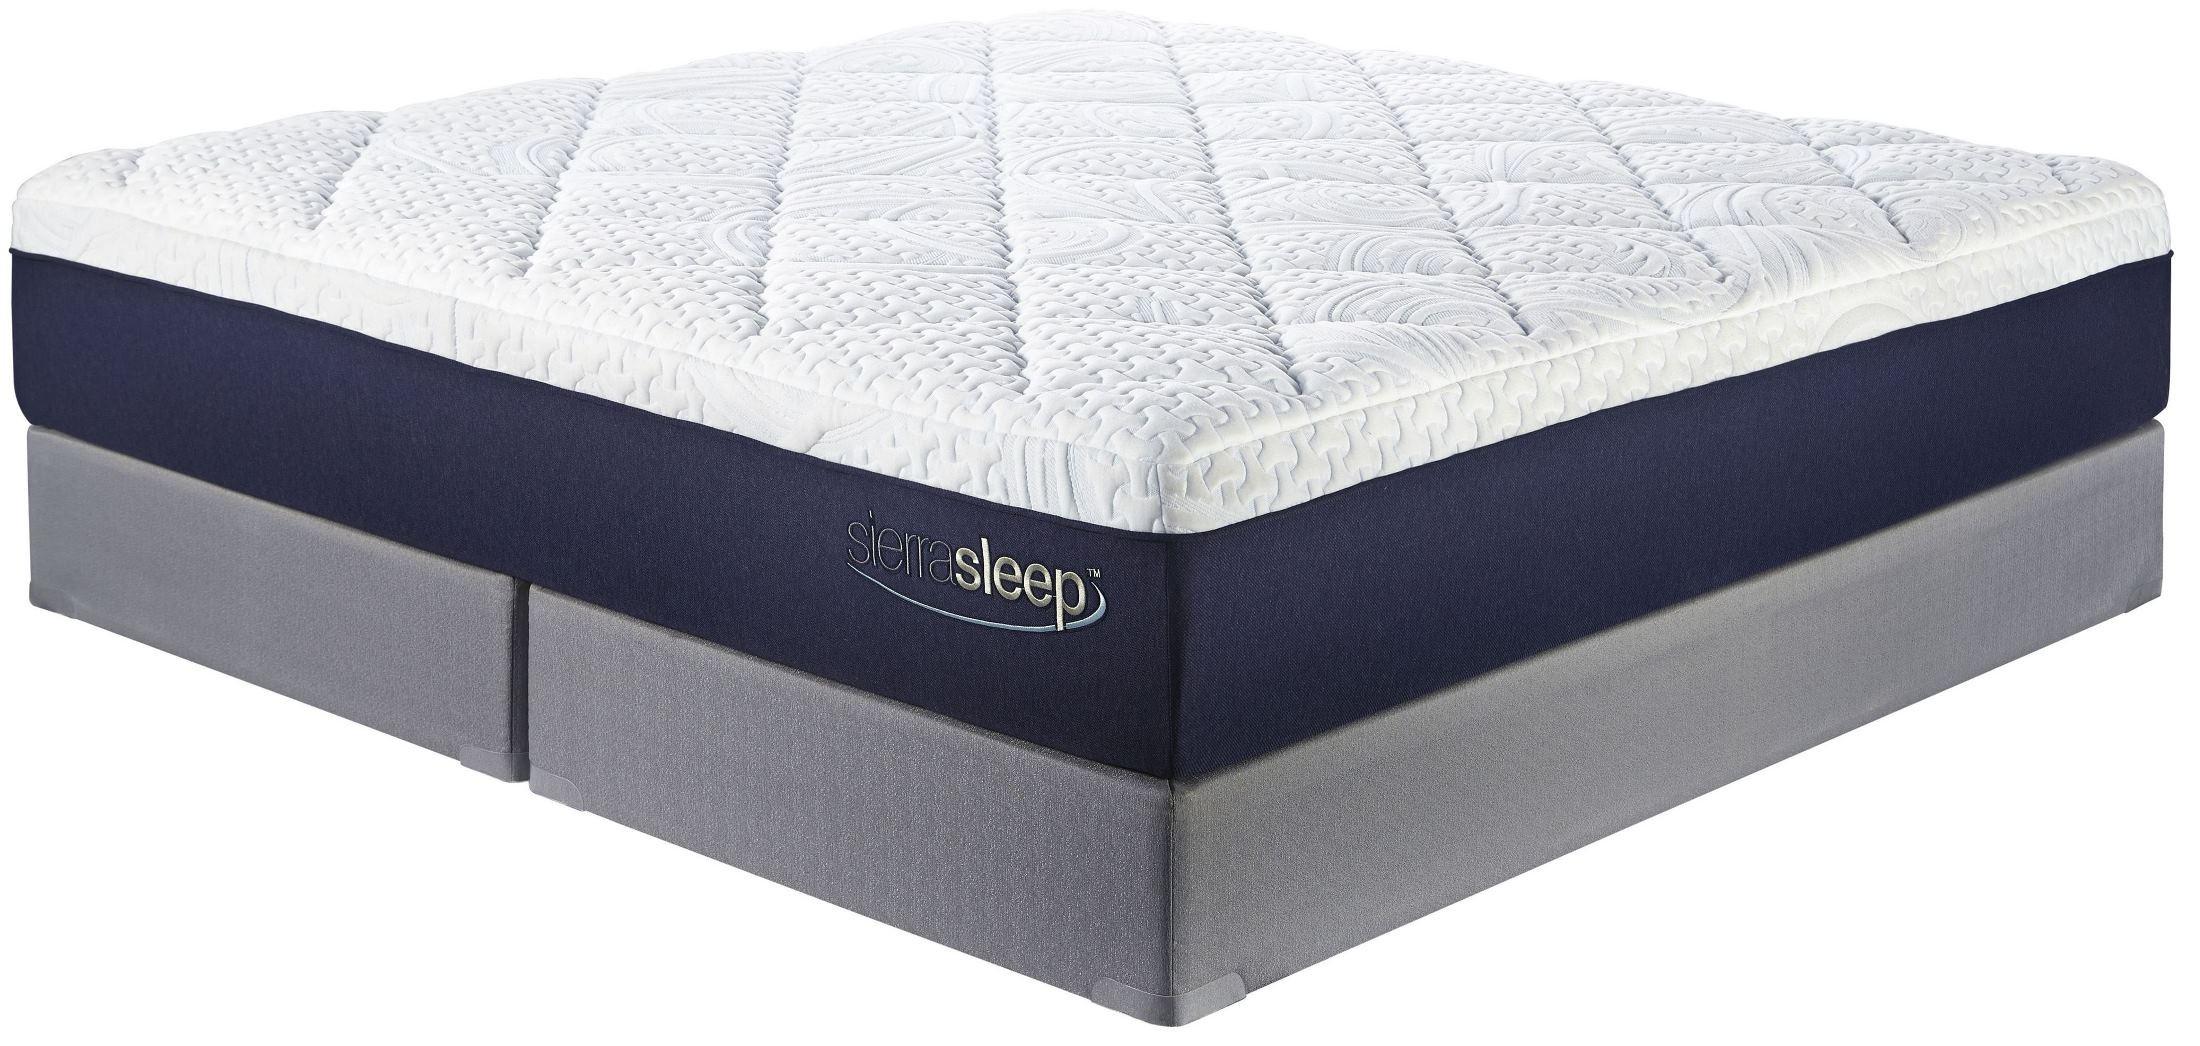 13 inch gel memory foam white queen mattress from ashley m97431 coleman furniture. Black Bedroom Furniture Sets. Home Design Ideas